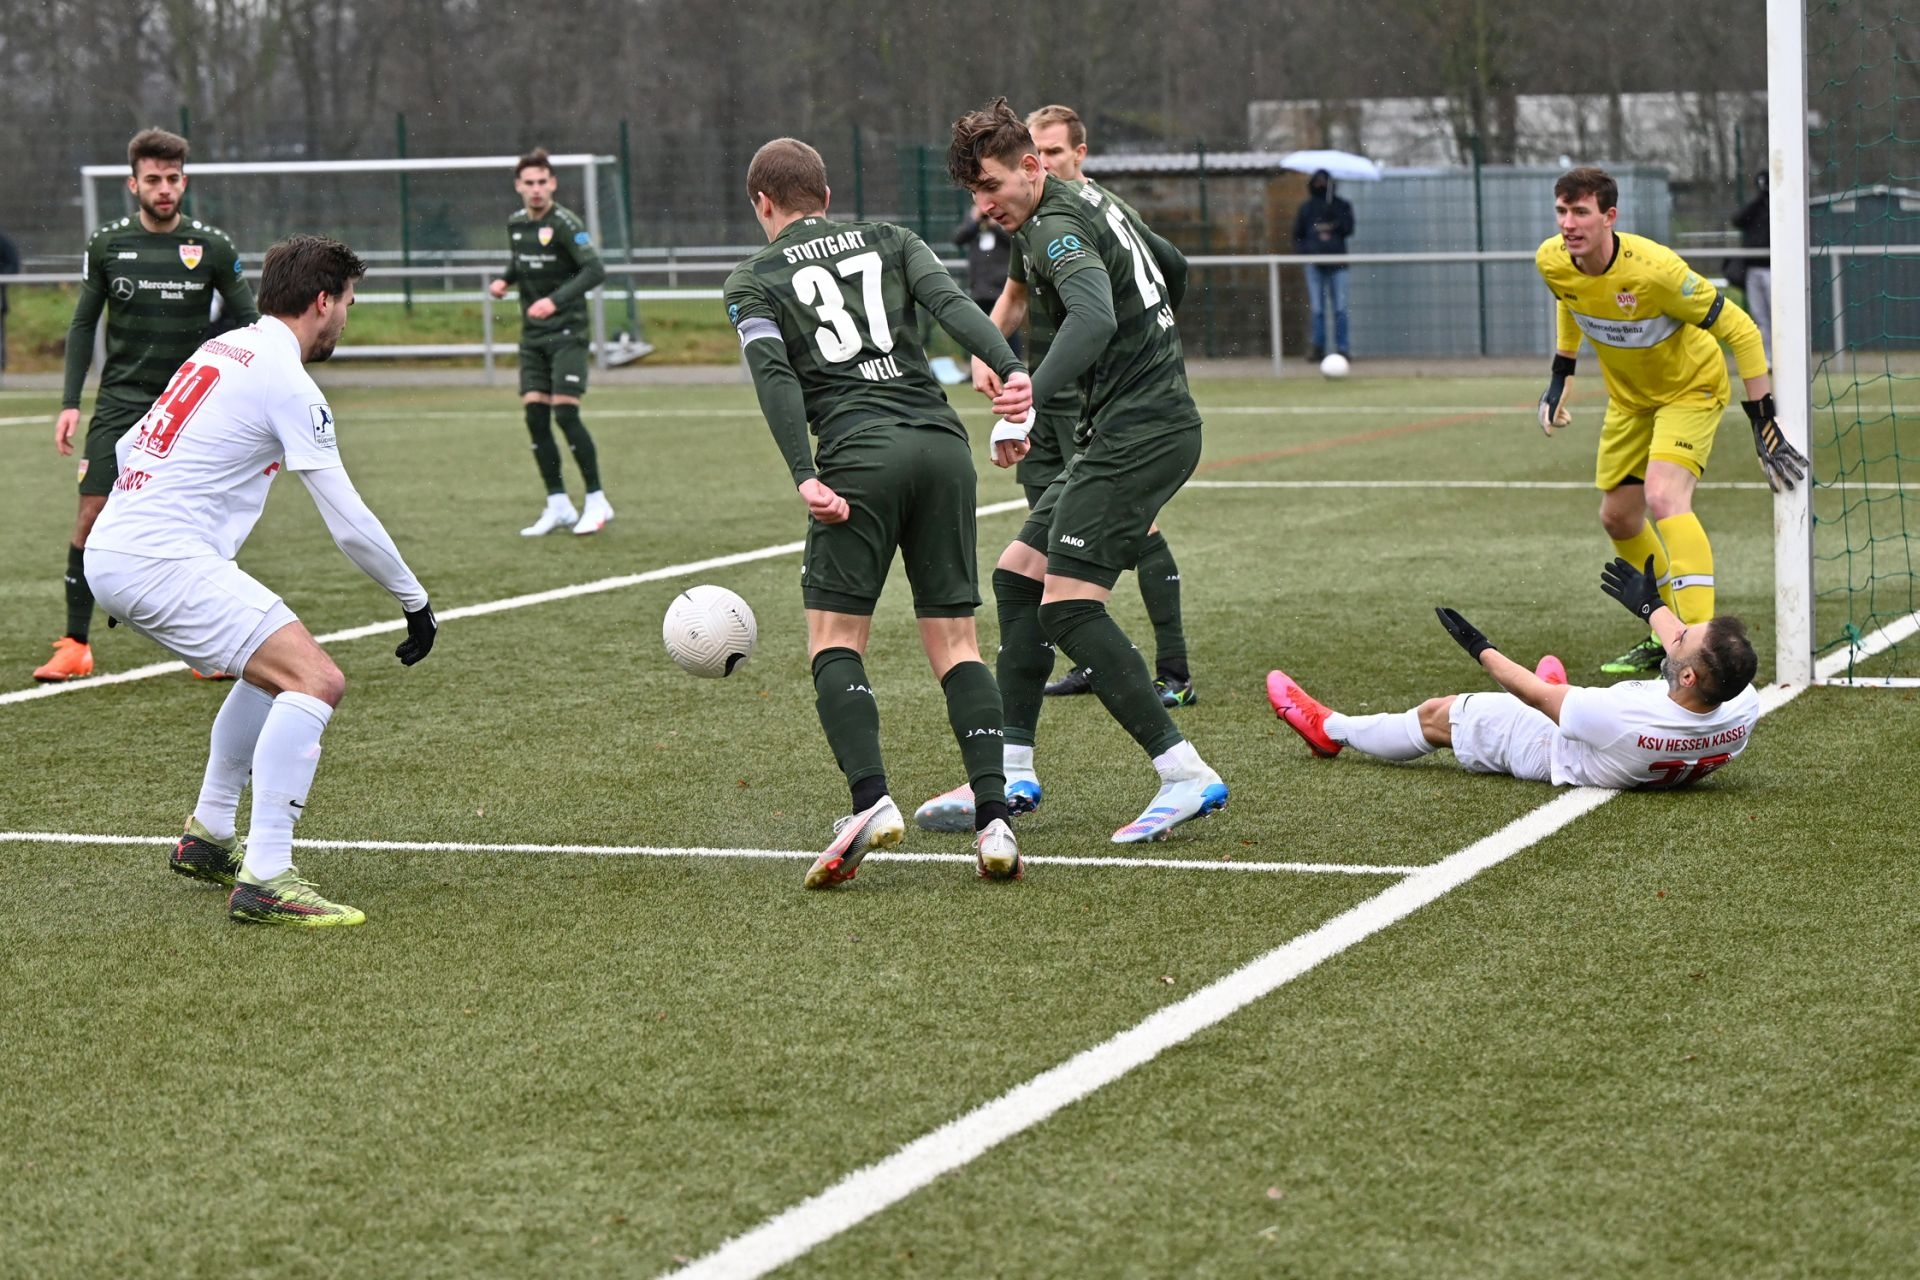 Regionalliga Südwest 2020/21, KSV Hessen Kassel, VfB Stuttgart II, Endstand 0:4, Nils Pichinot